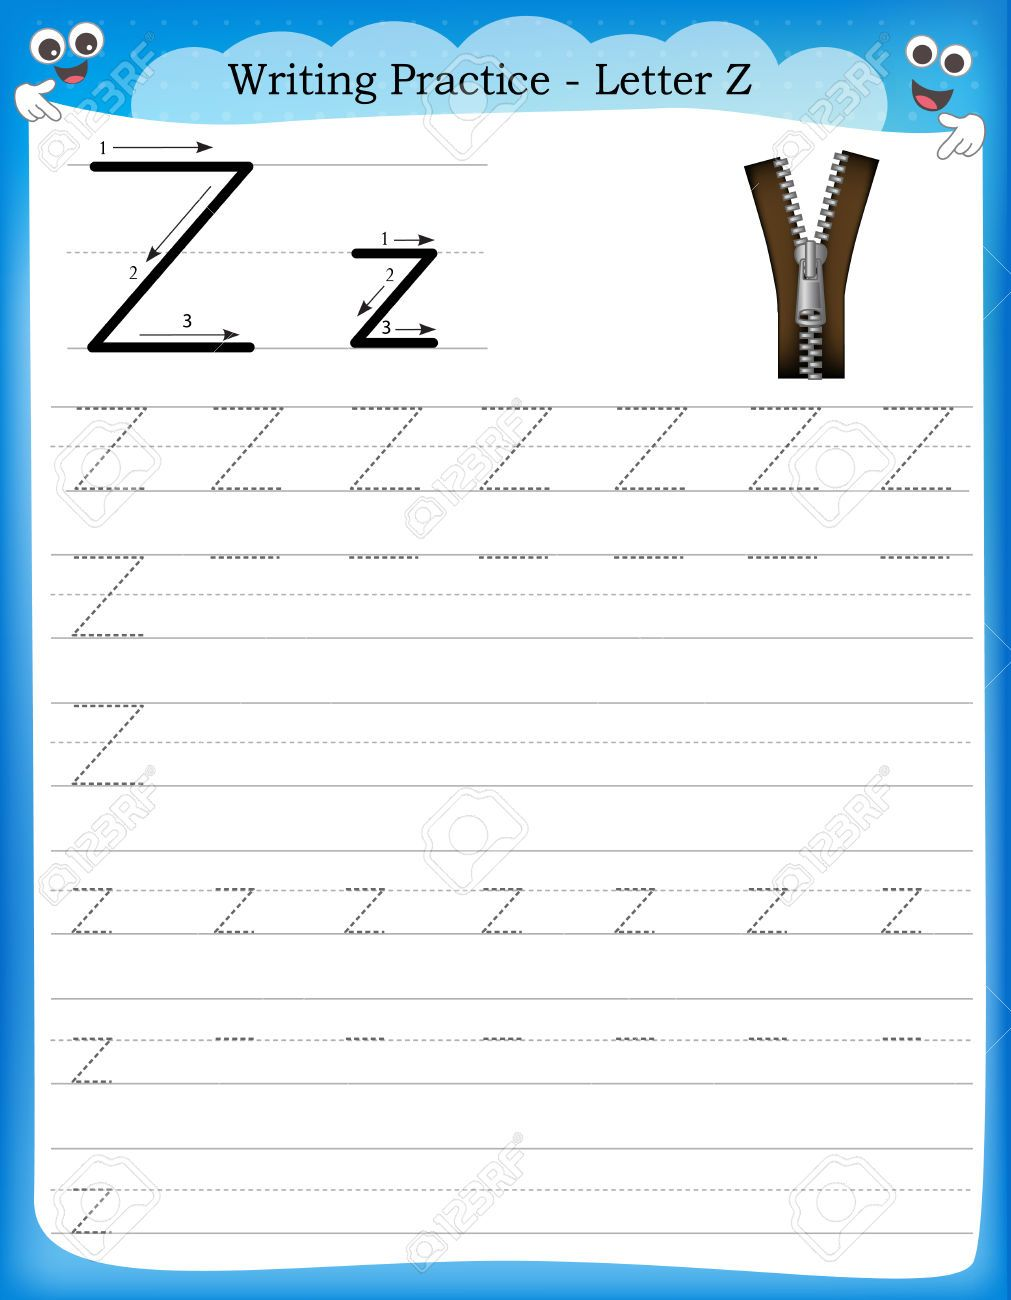 werkblad letter z - Google zoeken | letters | Pinterest